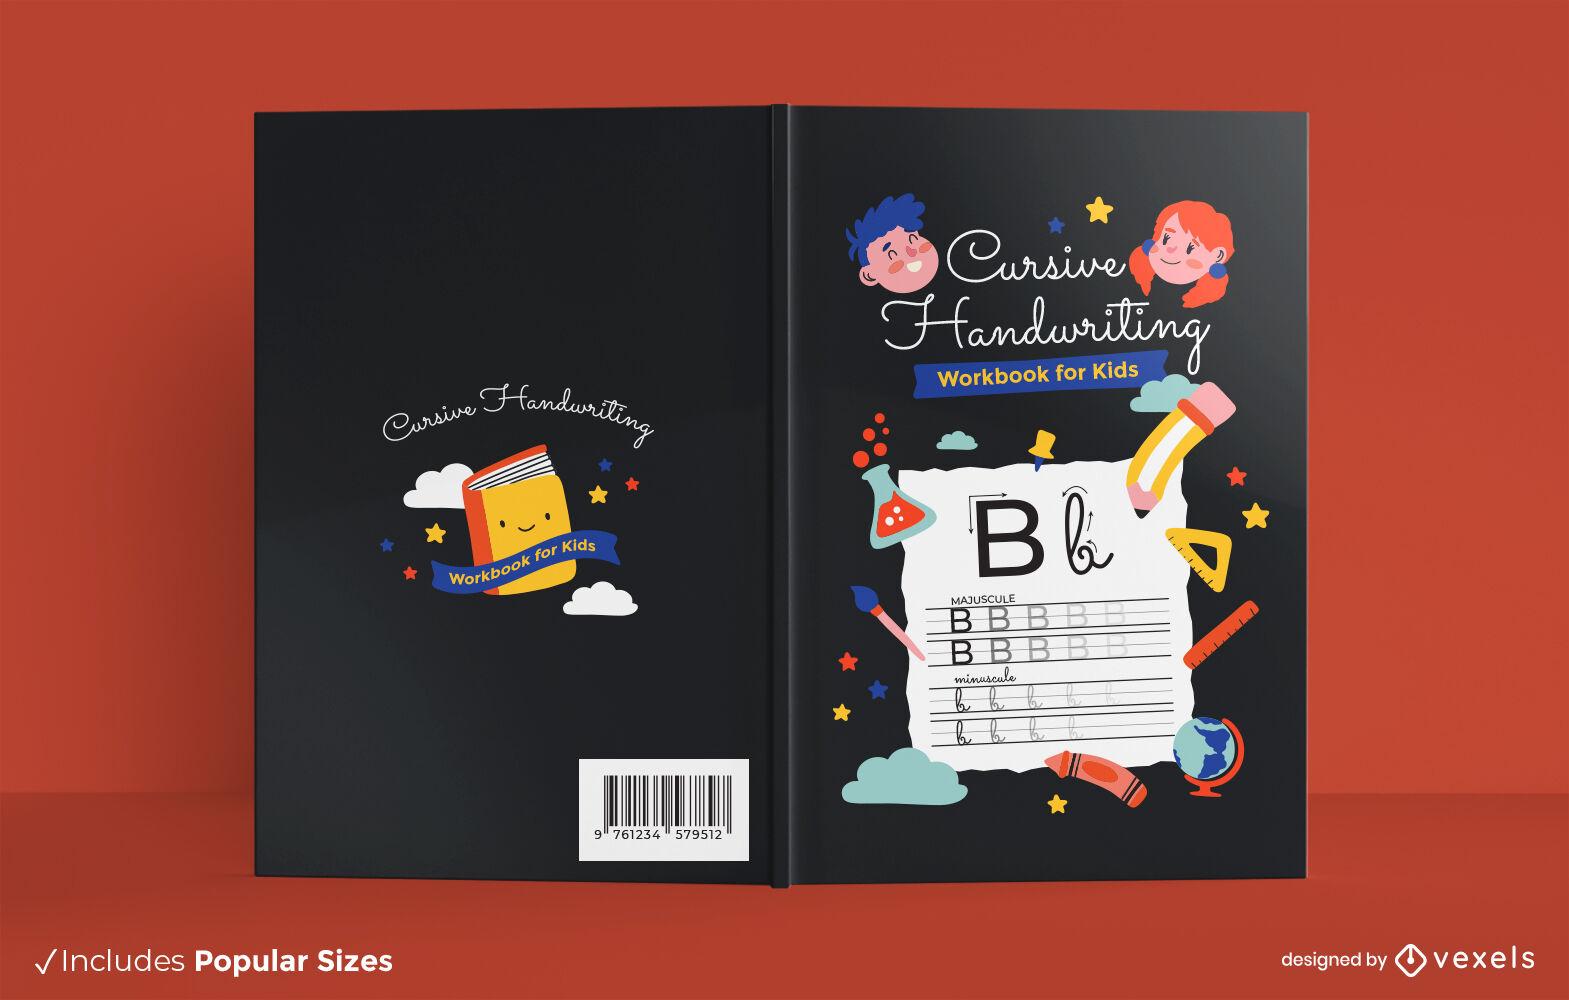 Handwriting children book cover design